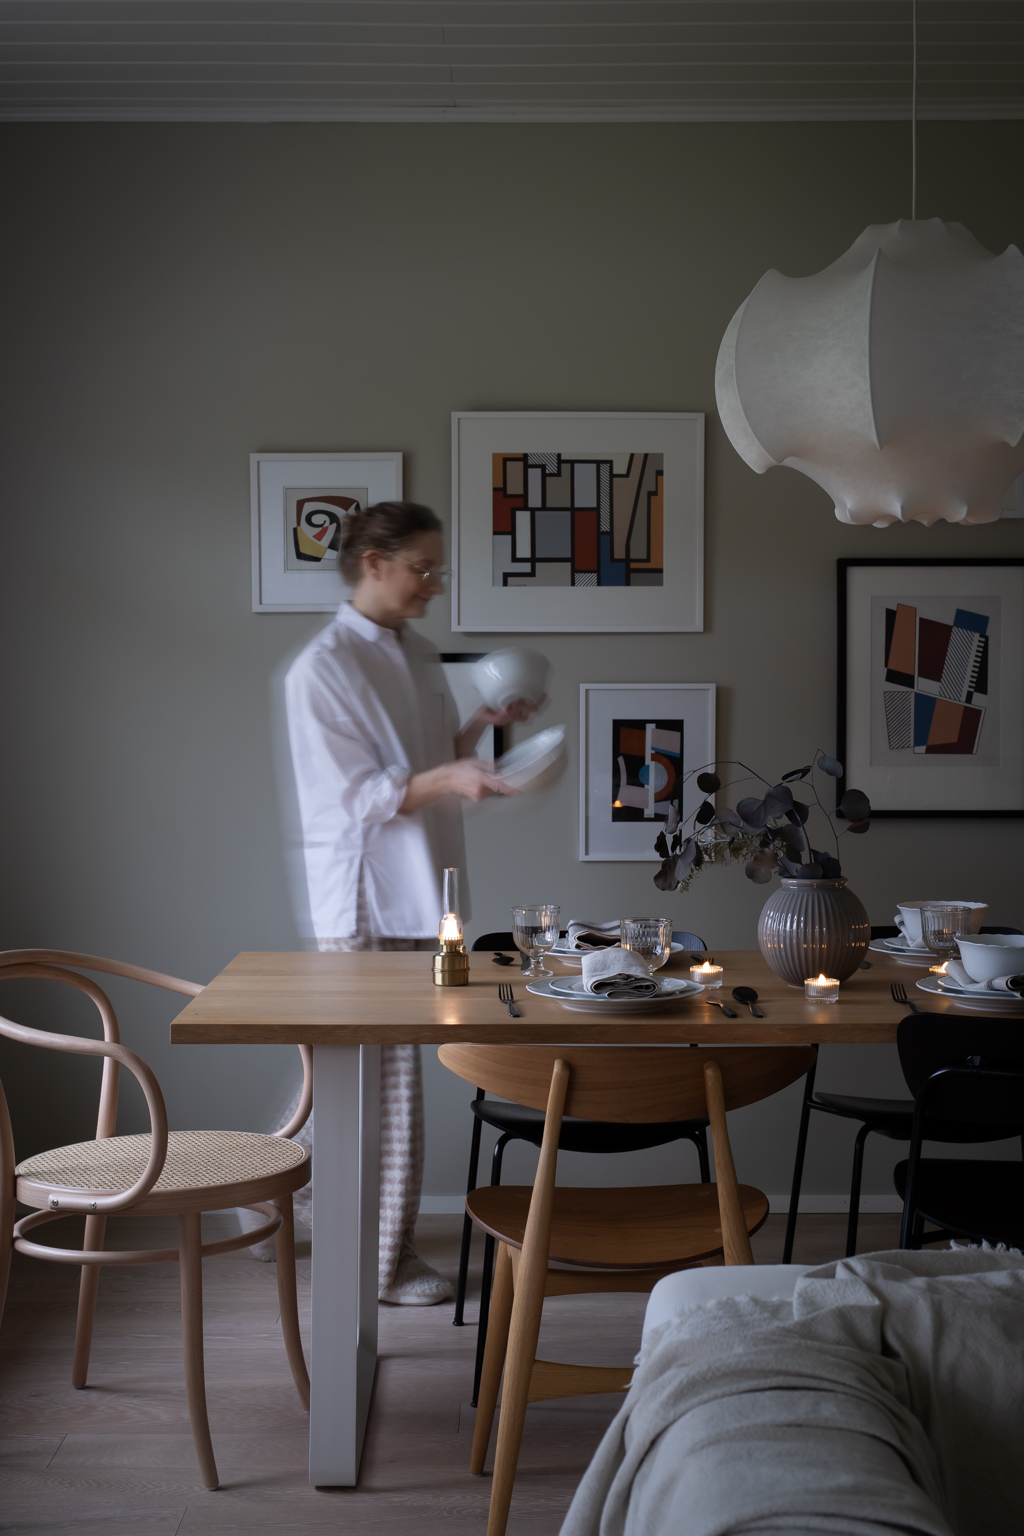 Anne Melender Ikea Joulukattaus 17